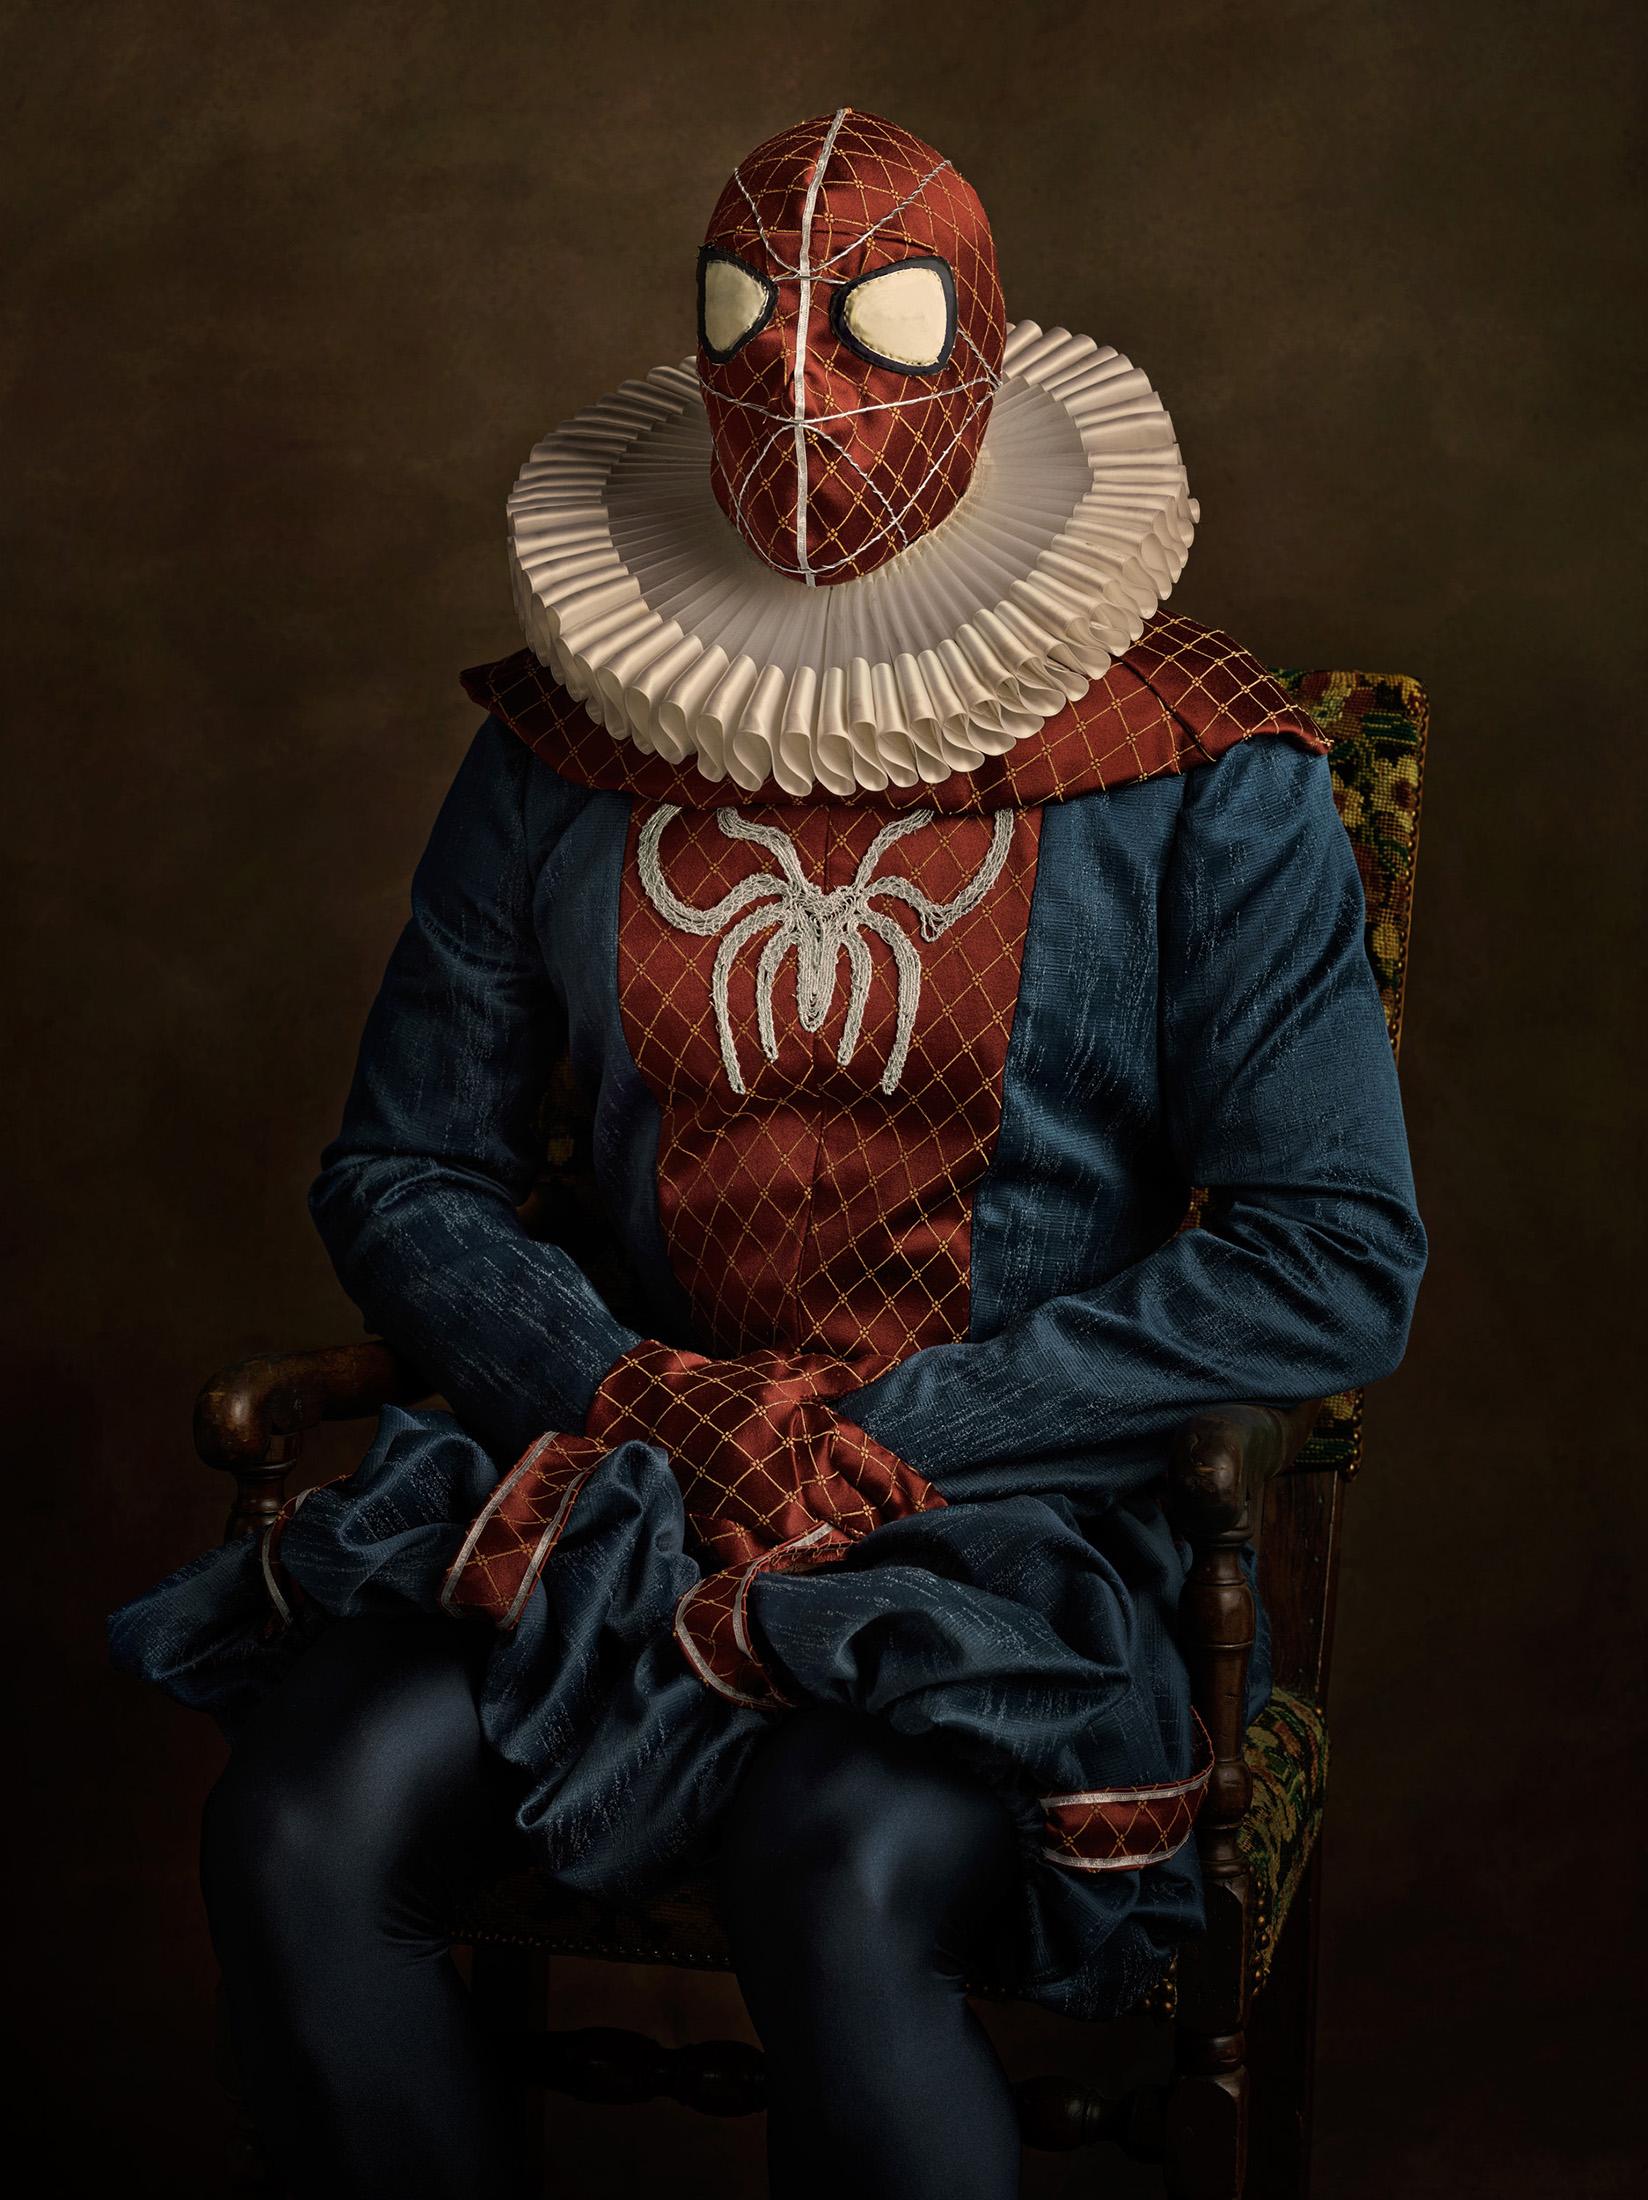 15_07_13_Super-Heros-Flamands-_16_spiderman_0825_02-copie